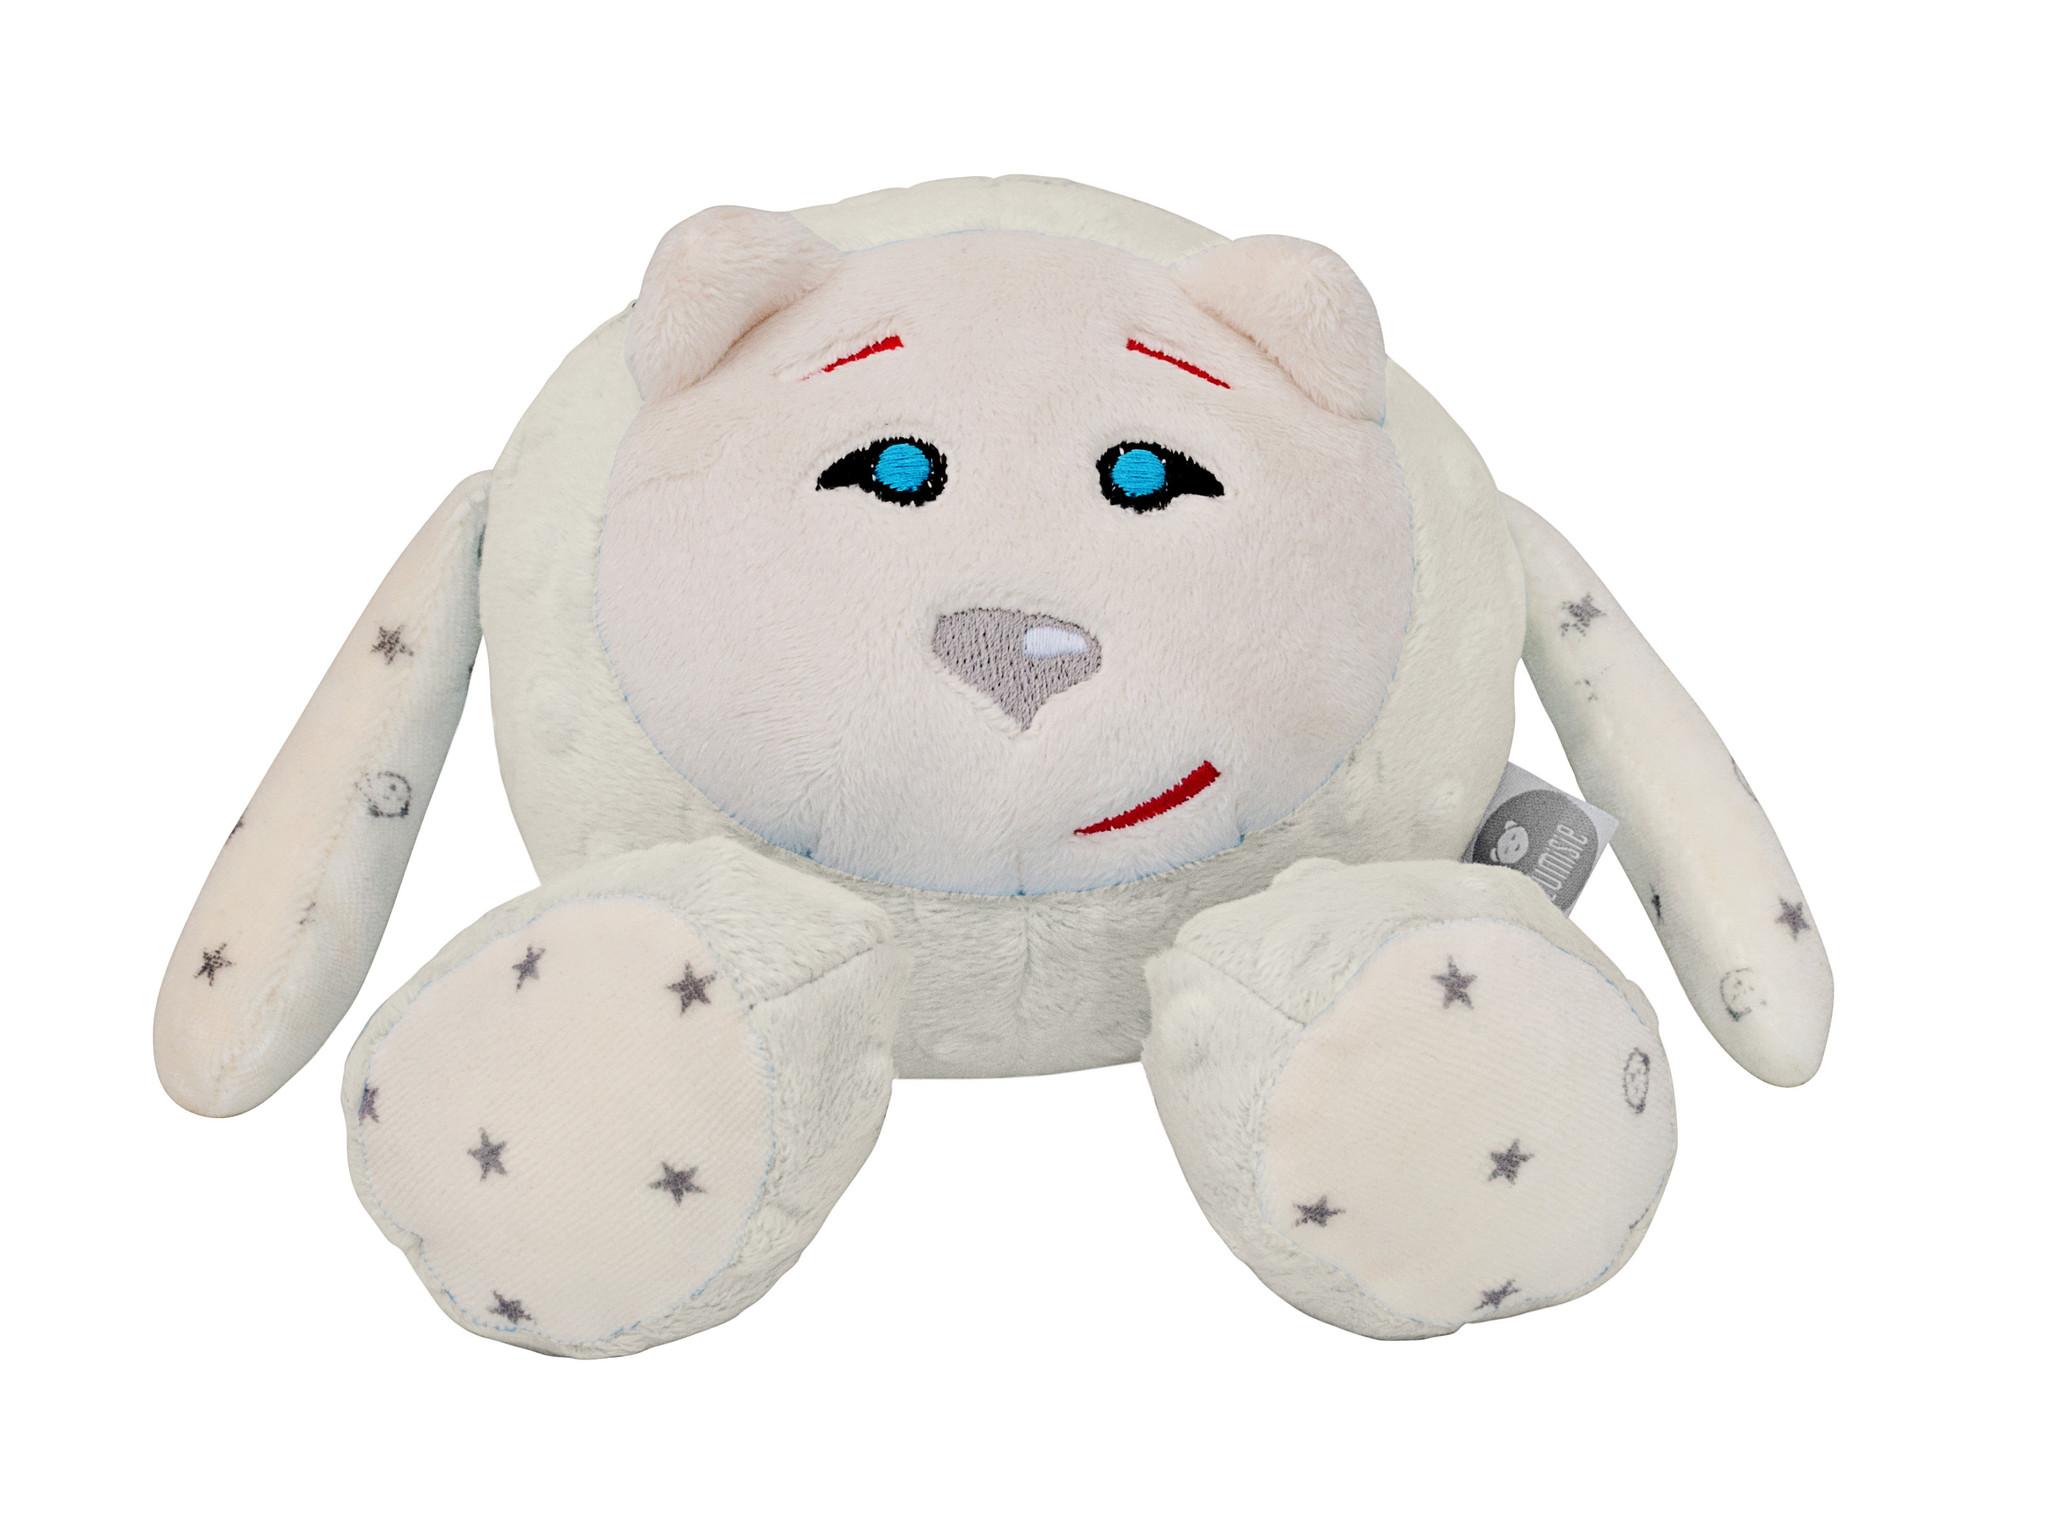 Mascot Ecru WITHOUT sound device